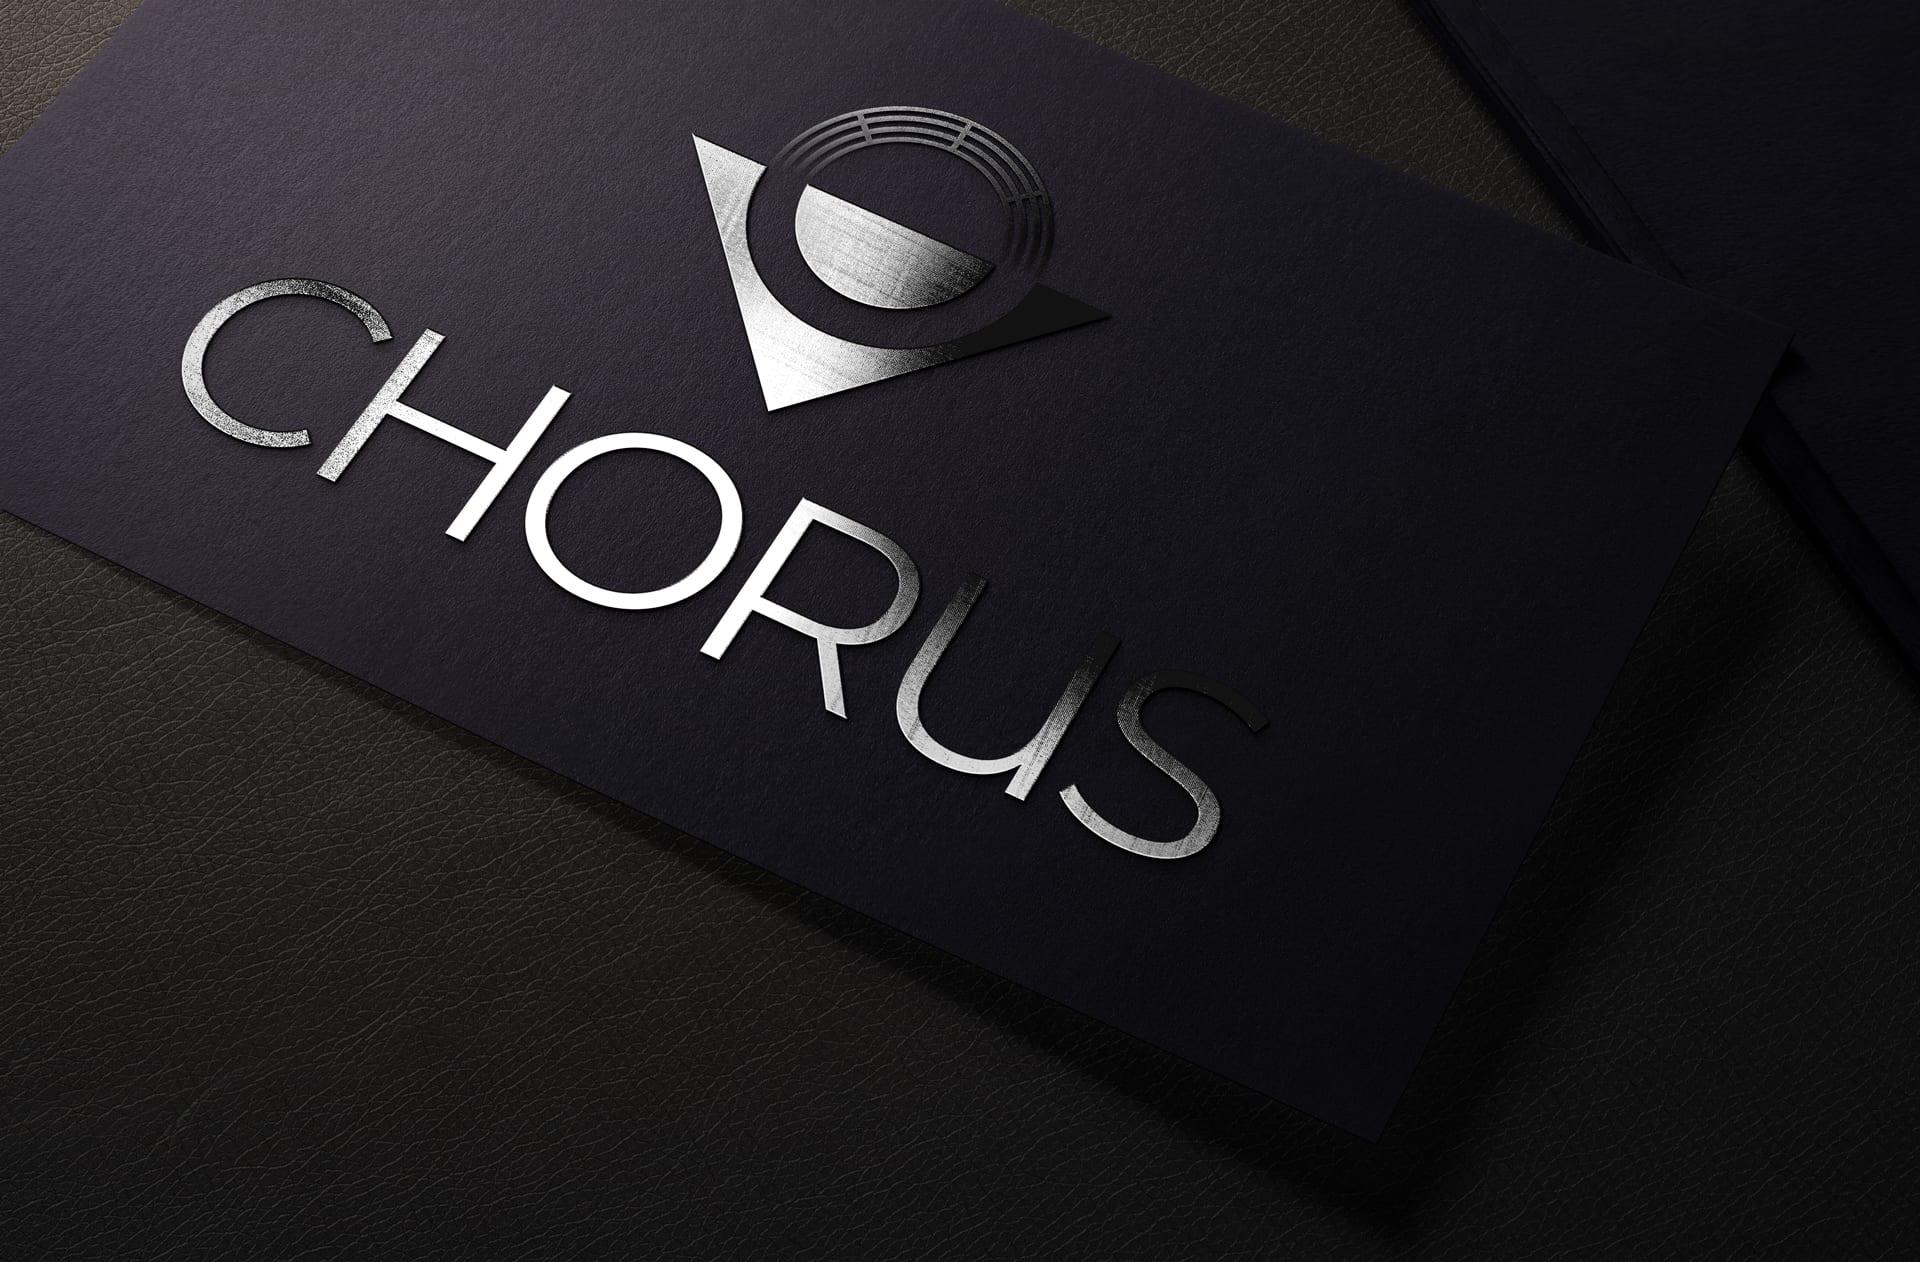 spot uv chorus logo